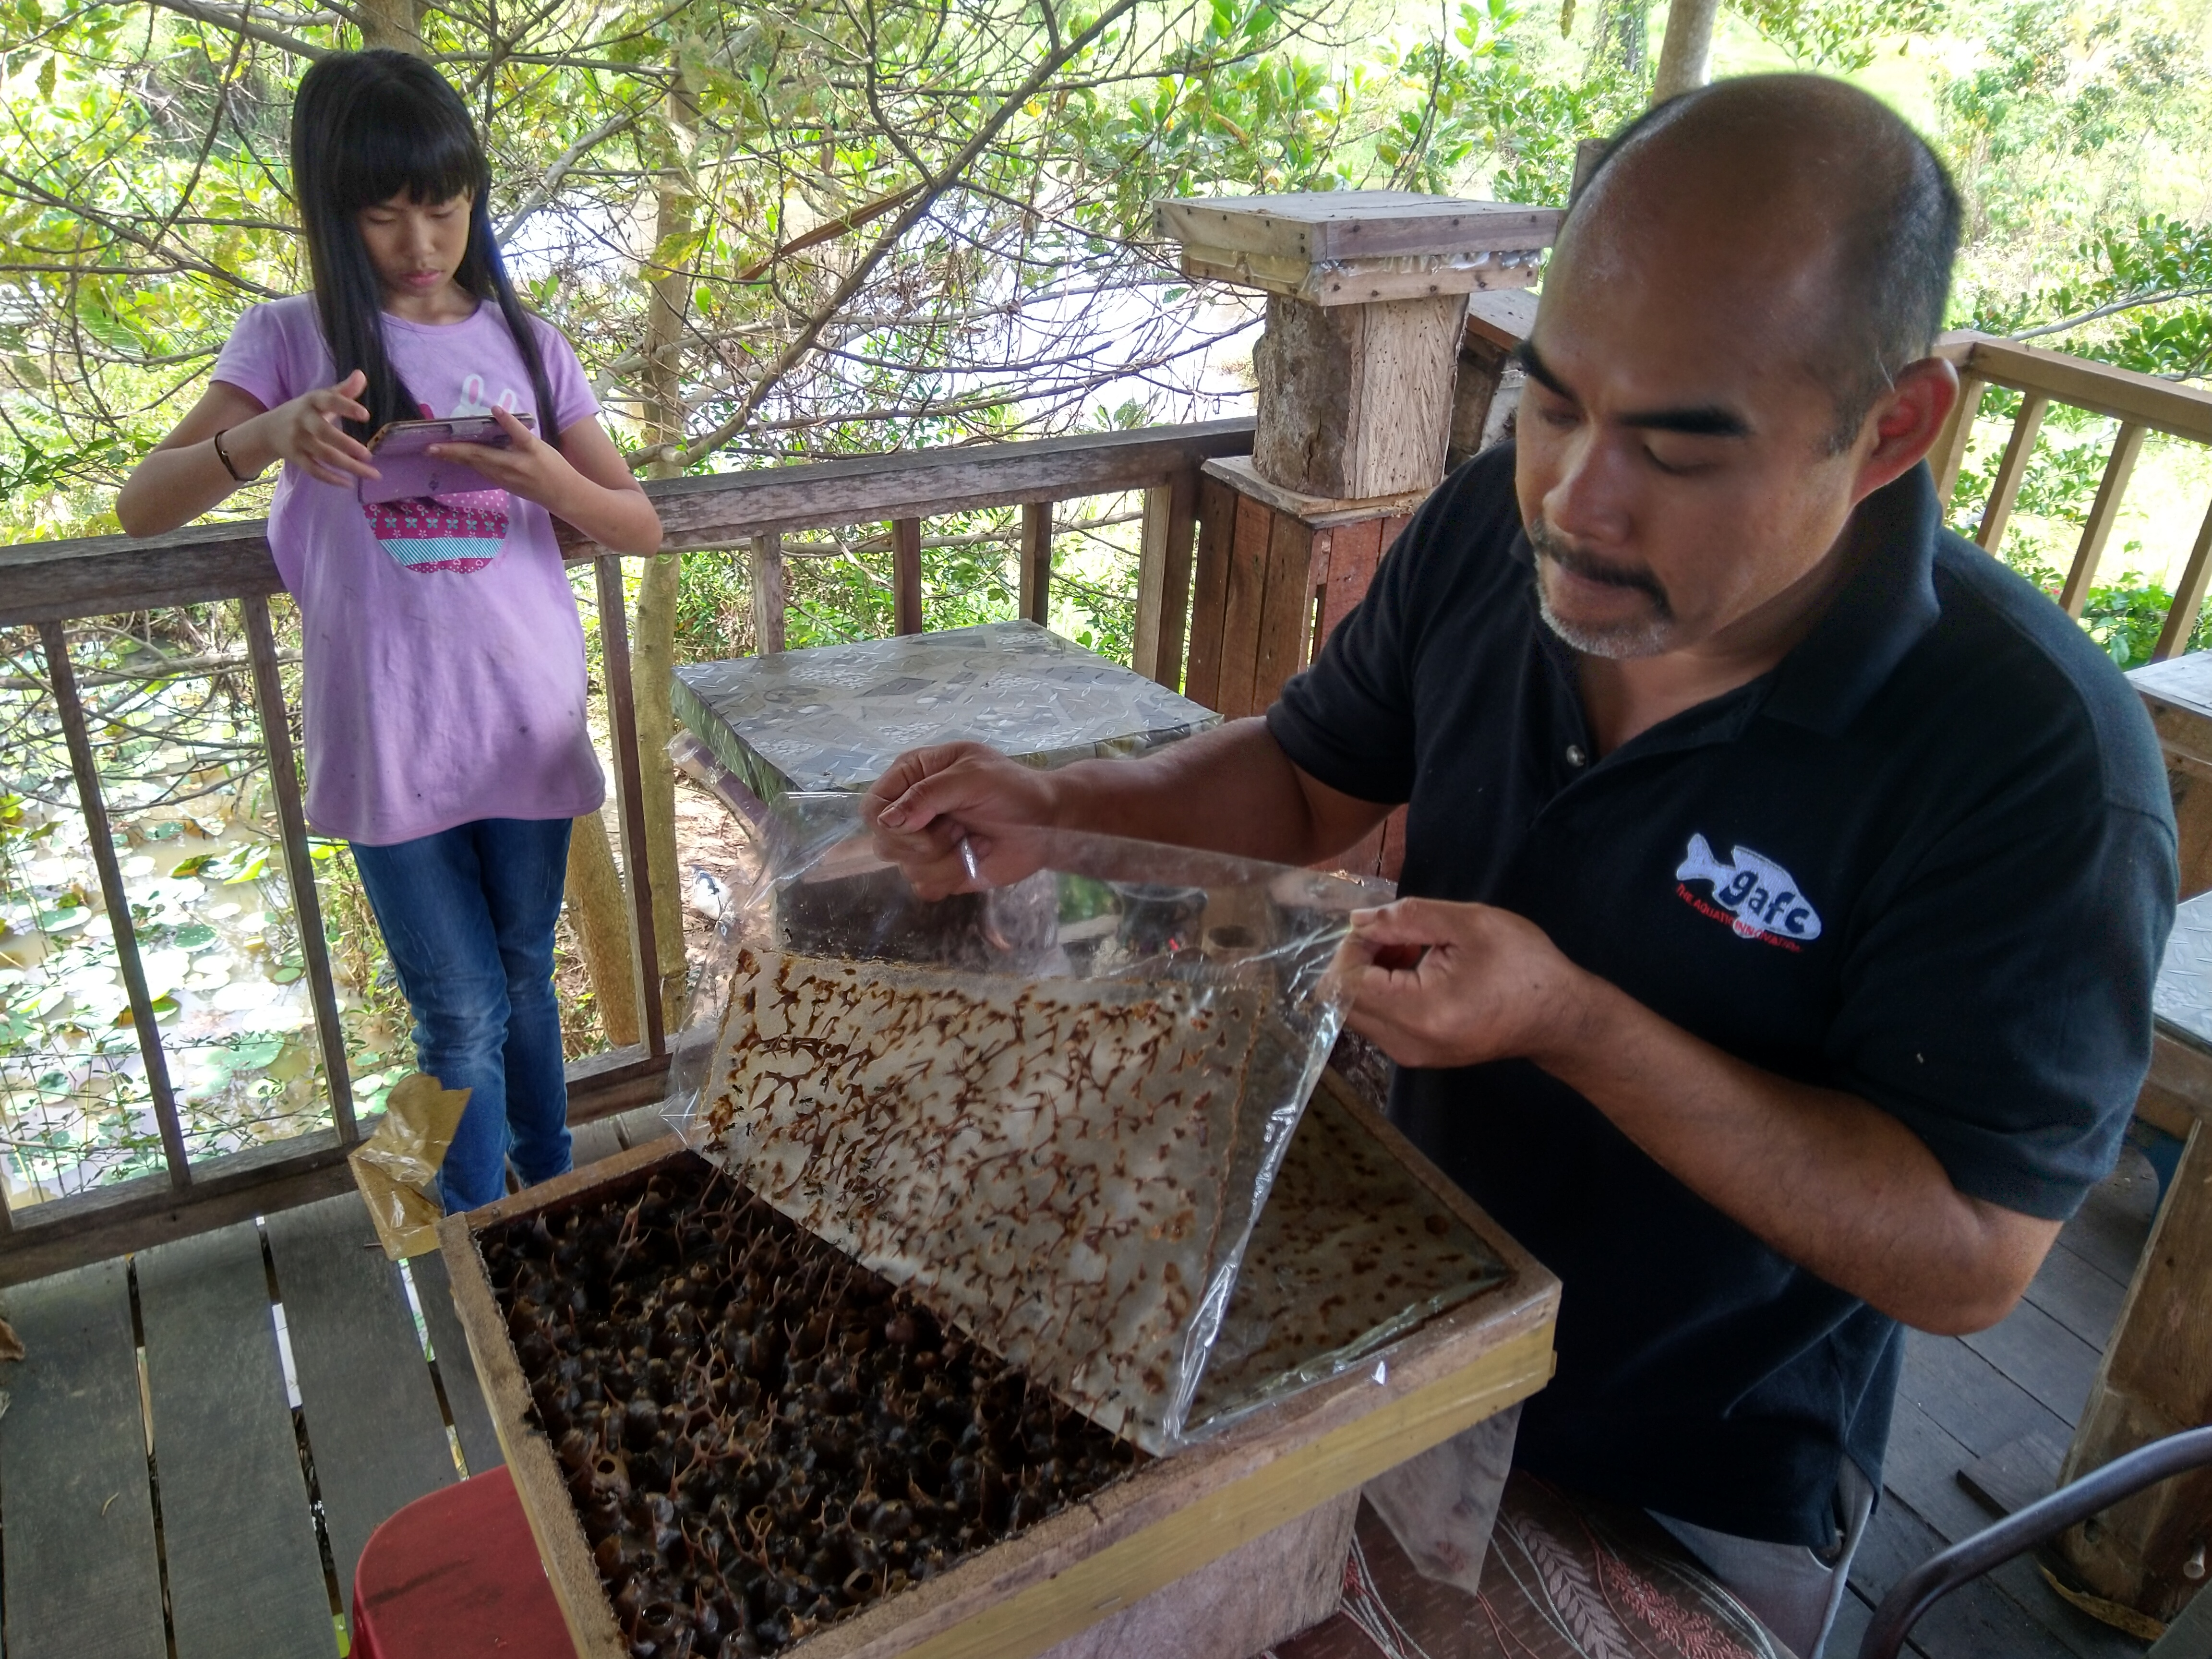 Opening stingless bee hive